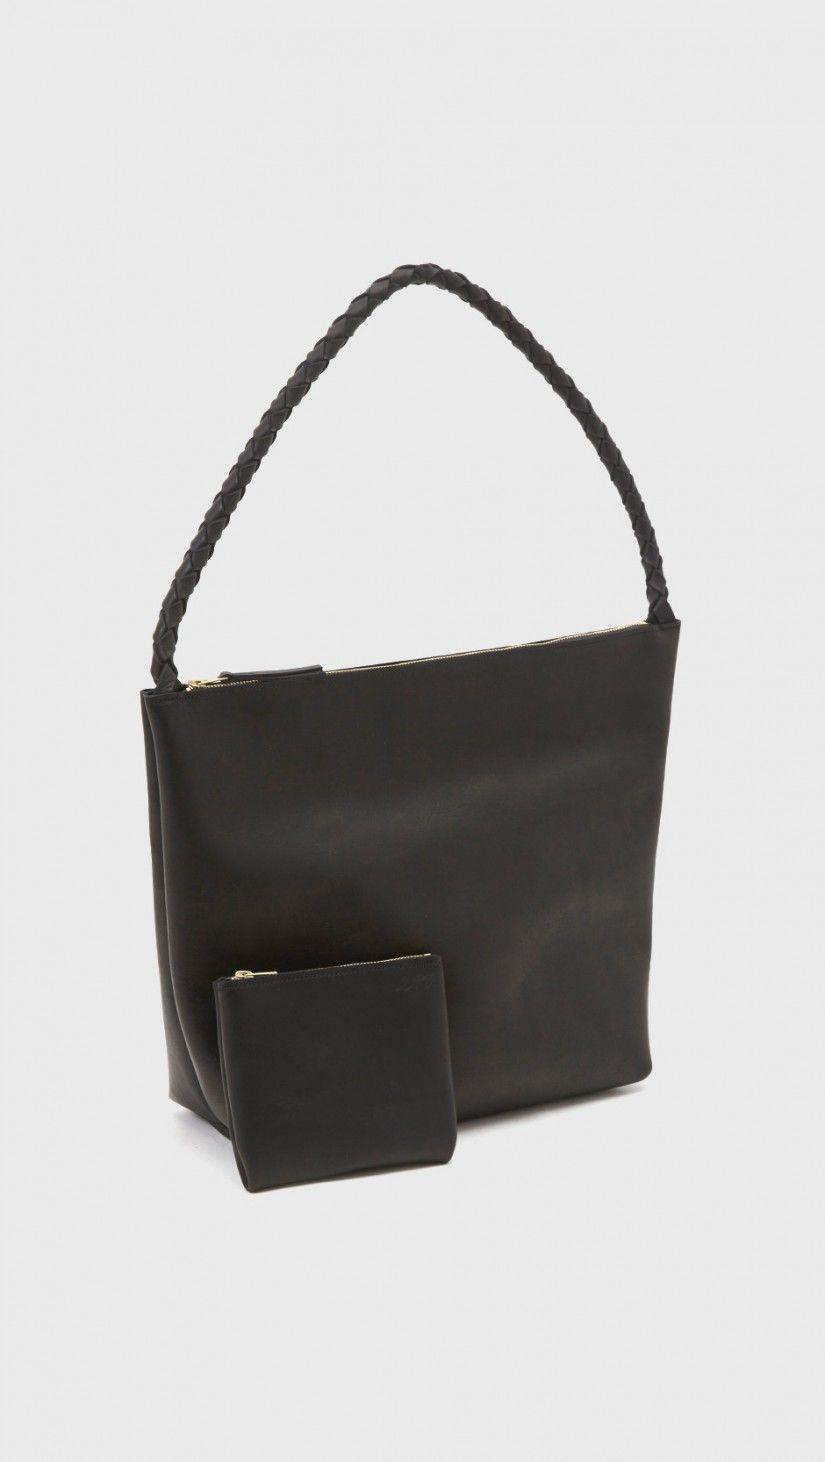 Ara Single Strap Zipper Tote No.1 in Black   The Dreslyn